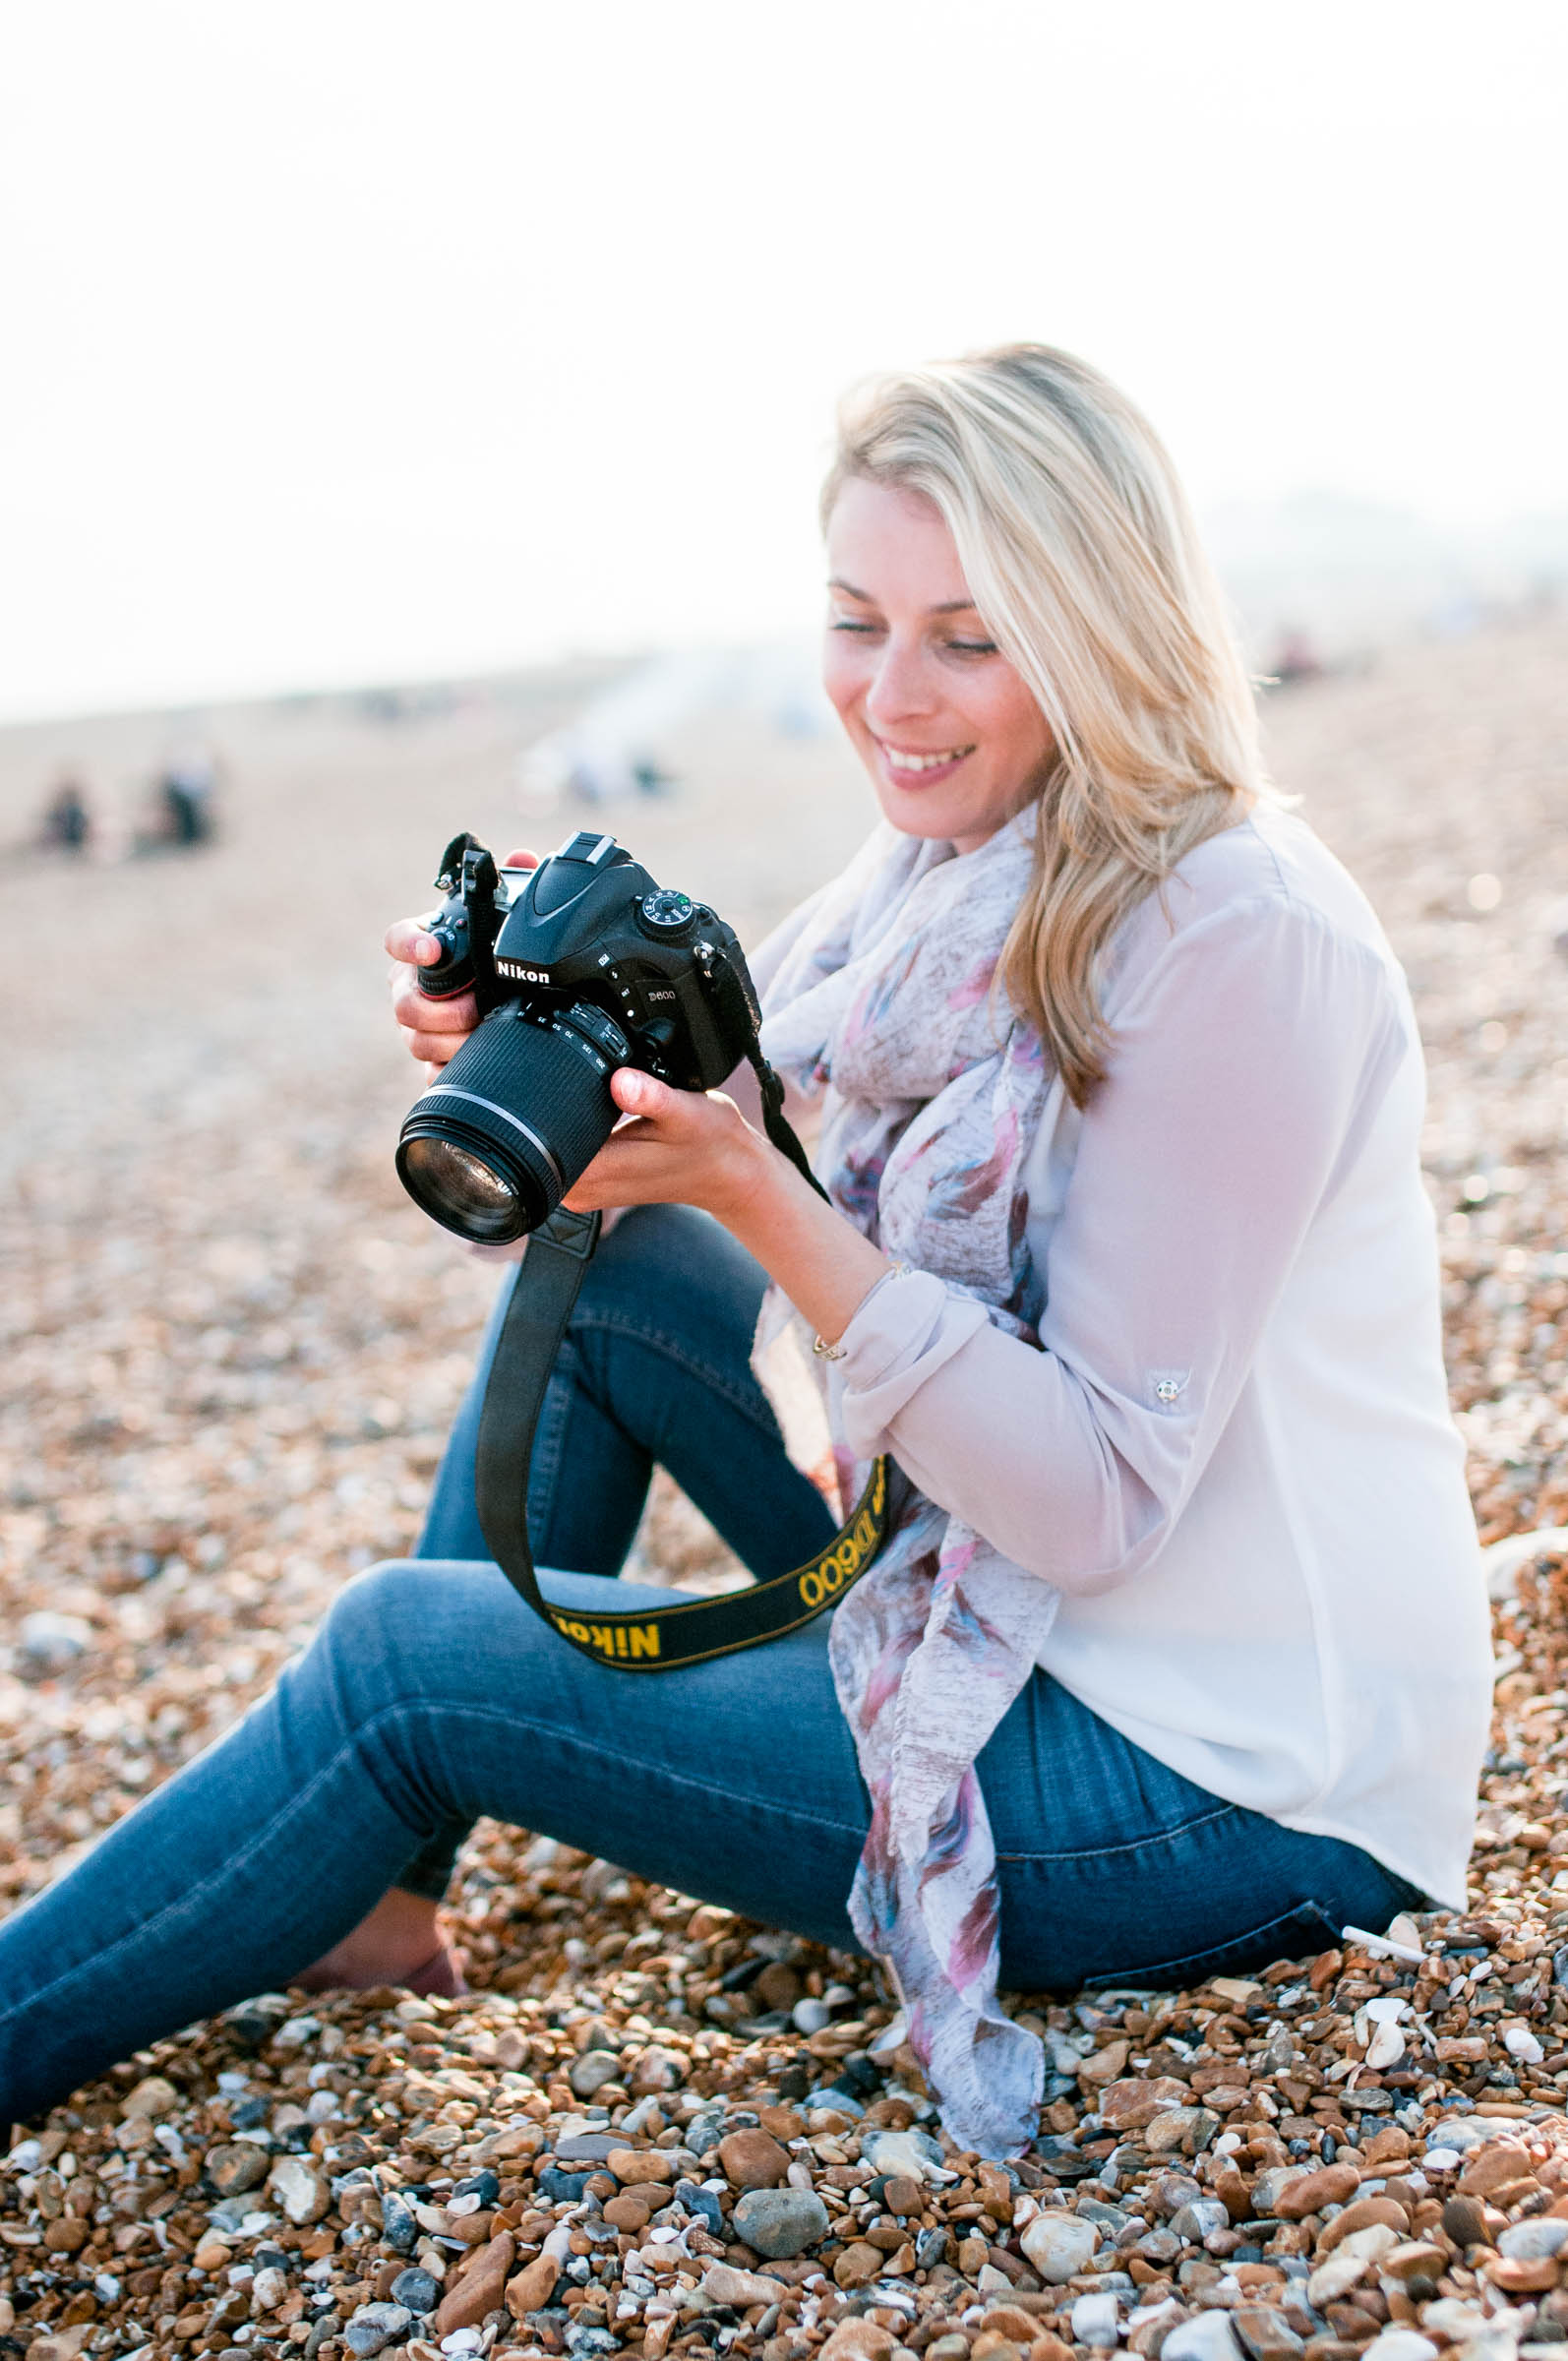 International Photographer Magdalena Smolarska Photography based in Brighton & London, UK